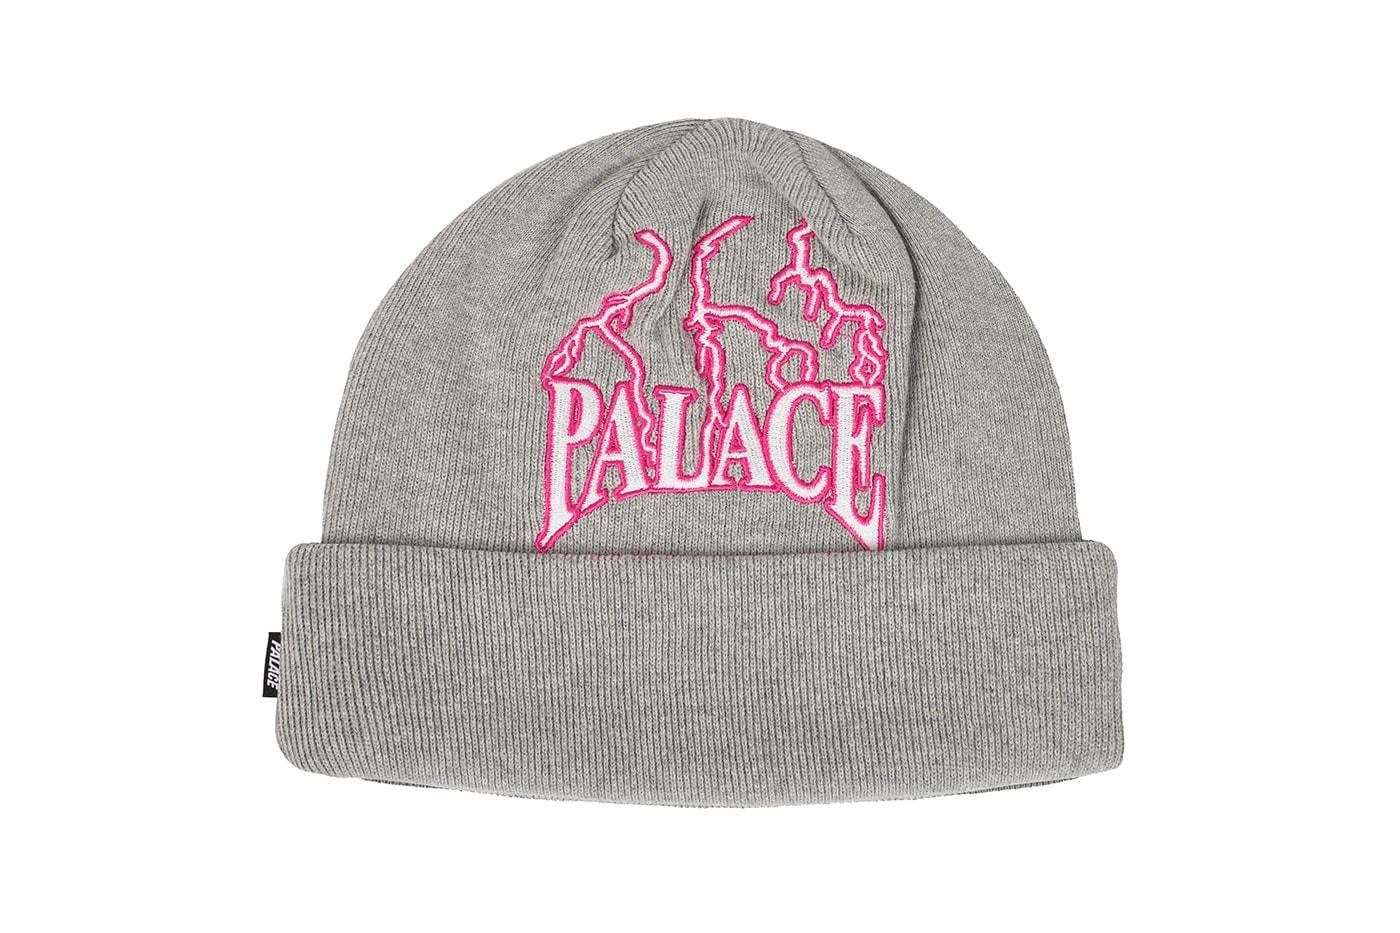 February 2021 Week 4 Drops Palace Star Wars BAIT Guerrilla-Group Brain Dead Richardson New Era Travis Scott i-D Billionaire Boys Club Timberland READYMADE BAPE